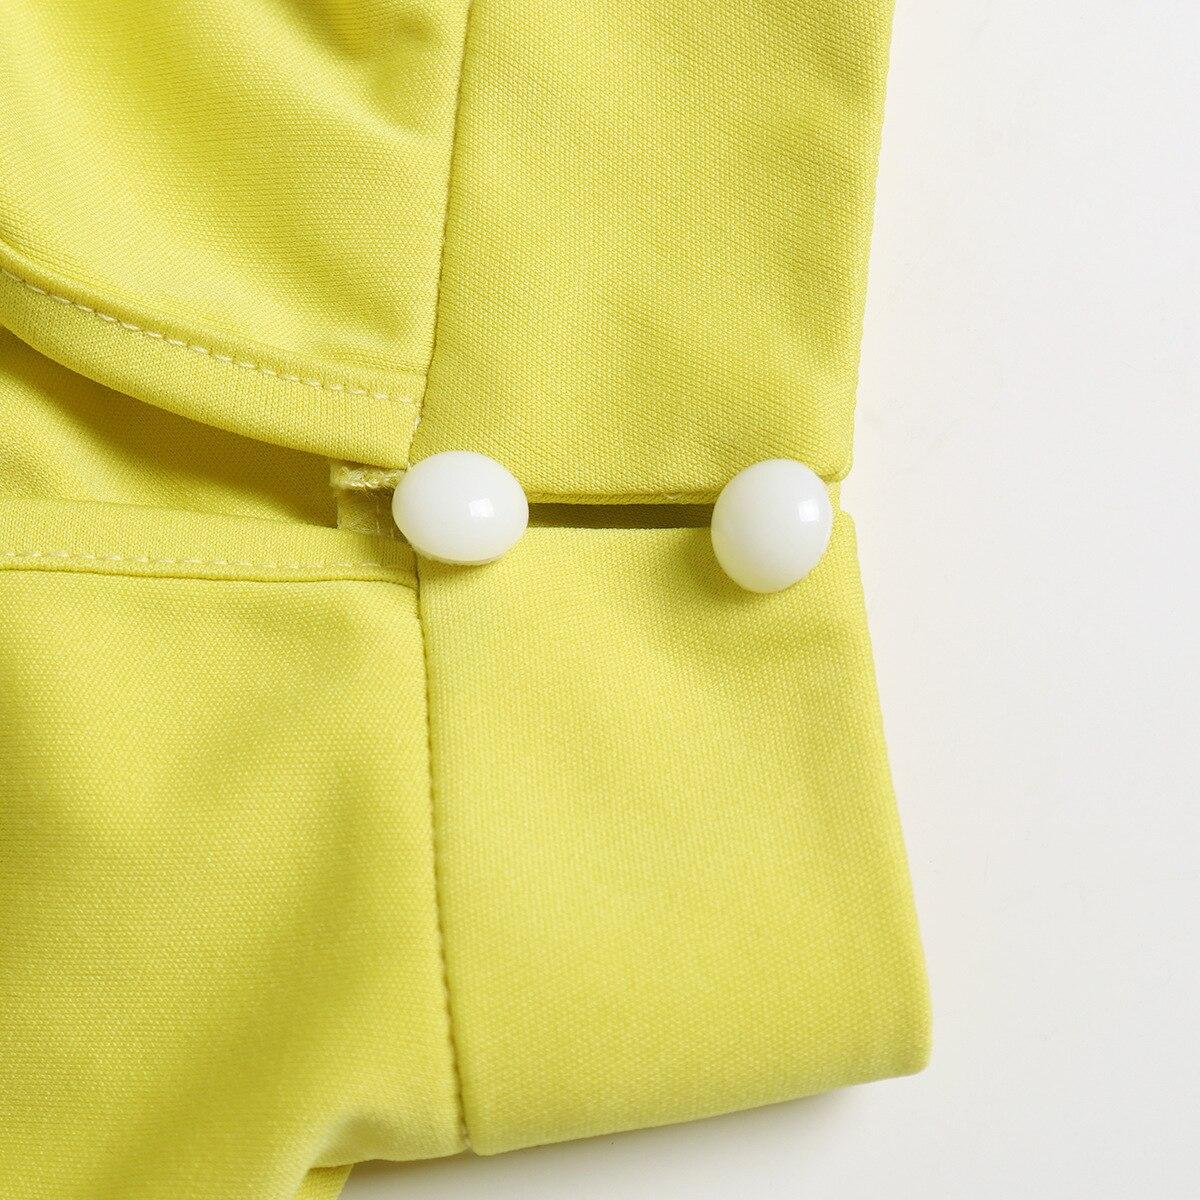 Image 5 - Turtleneck Lantern Sleeve Loose Rompers Womens Jumpsuit Tunic Wide Leg Flare Pants Elegant Overalls Yellow Black White JumpsuitJumpsuits   -